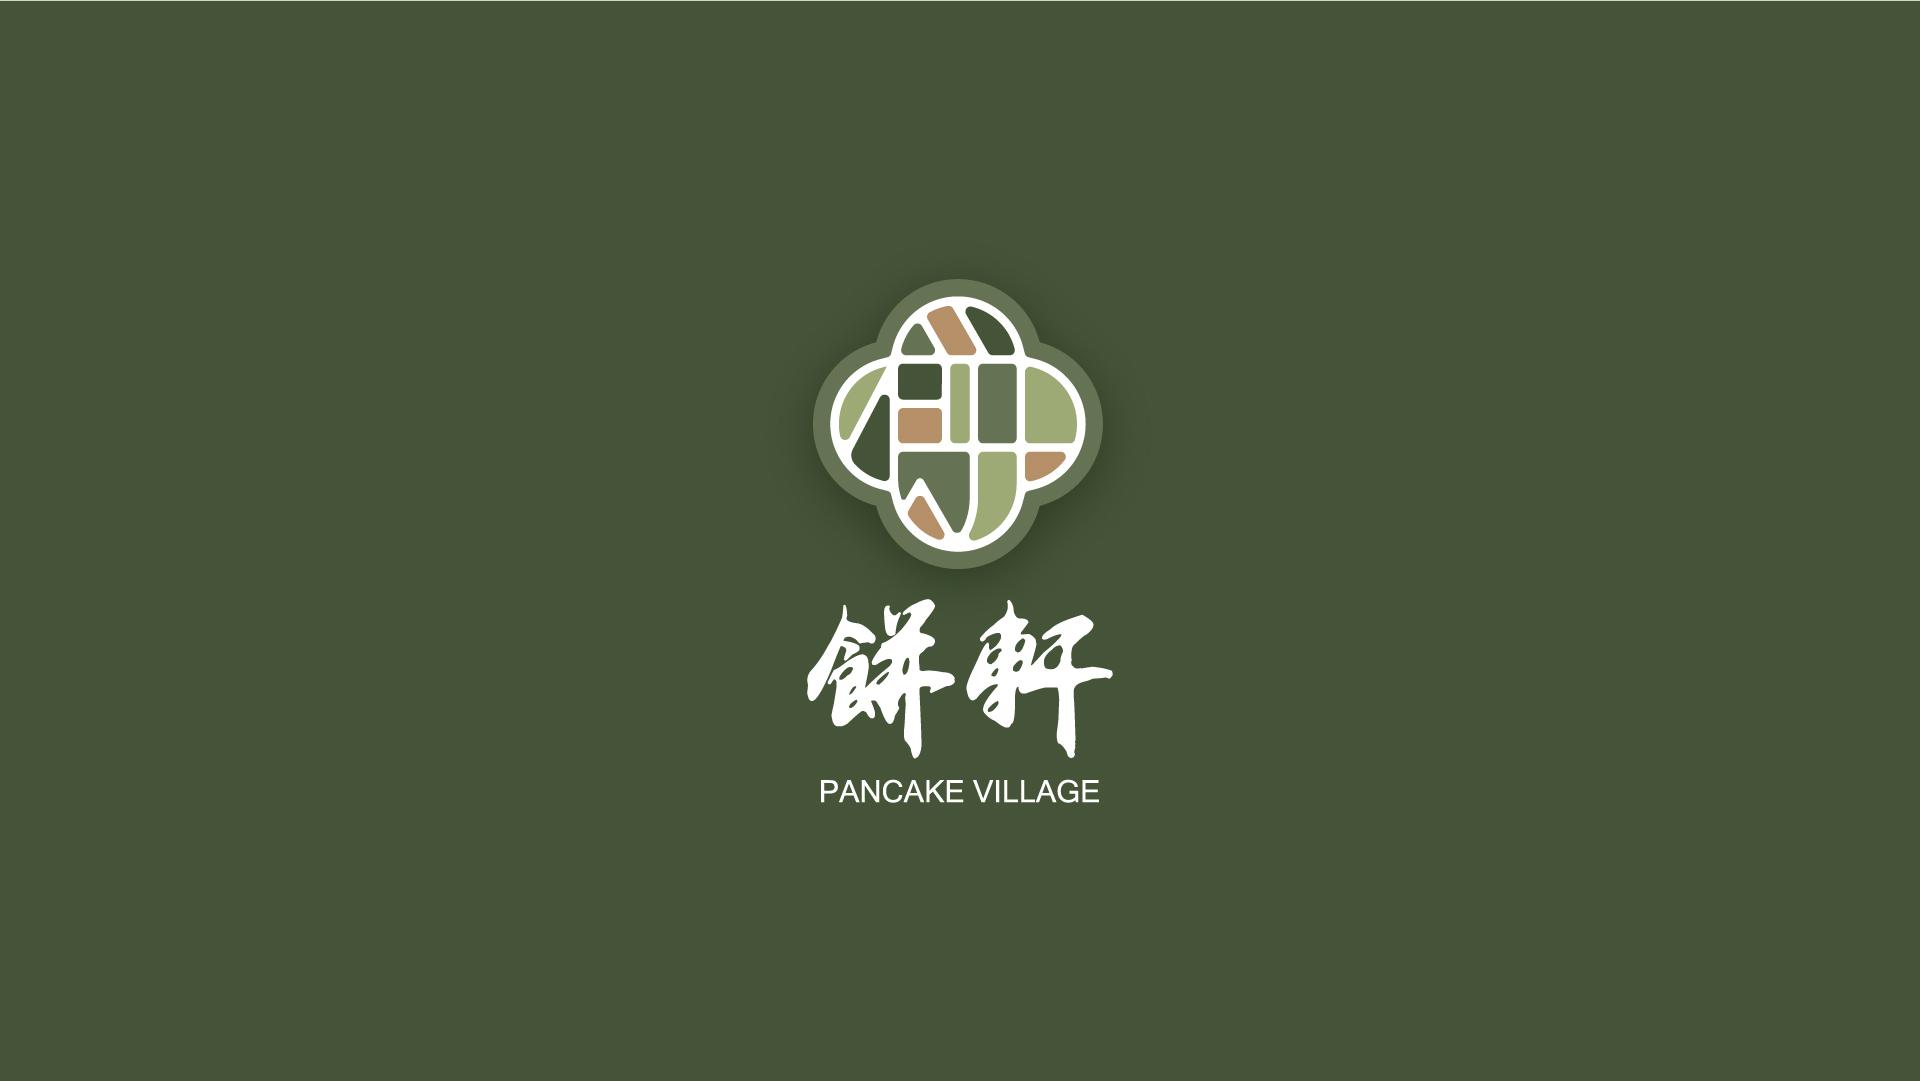 pancake village branding by Z Creative Studio Branding & Graphic Design Melbourne